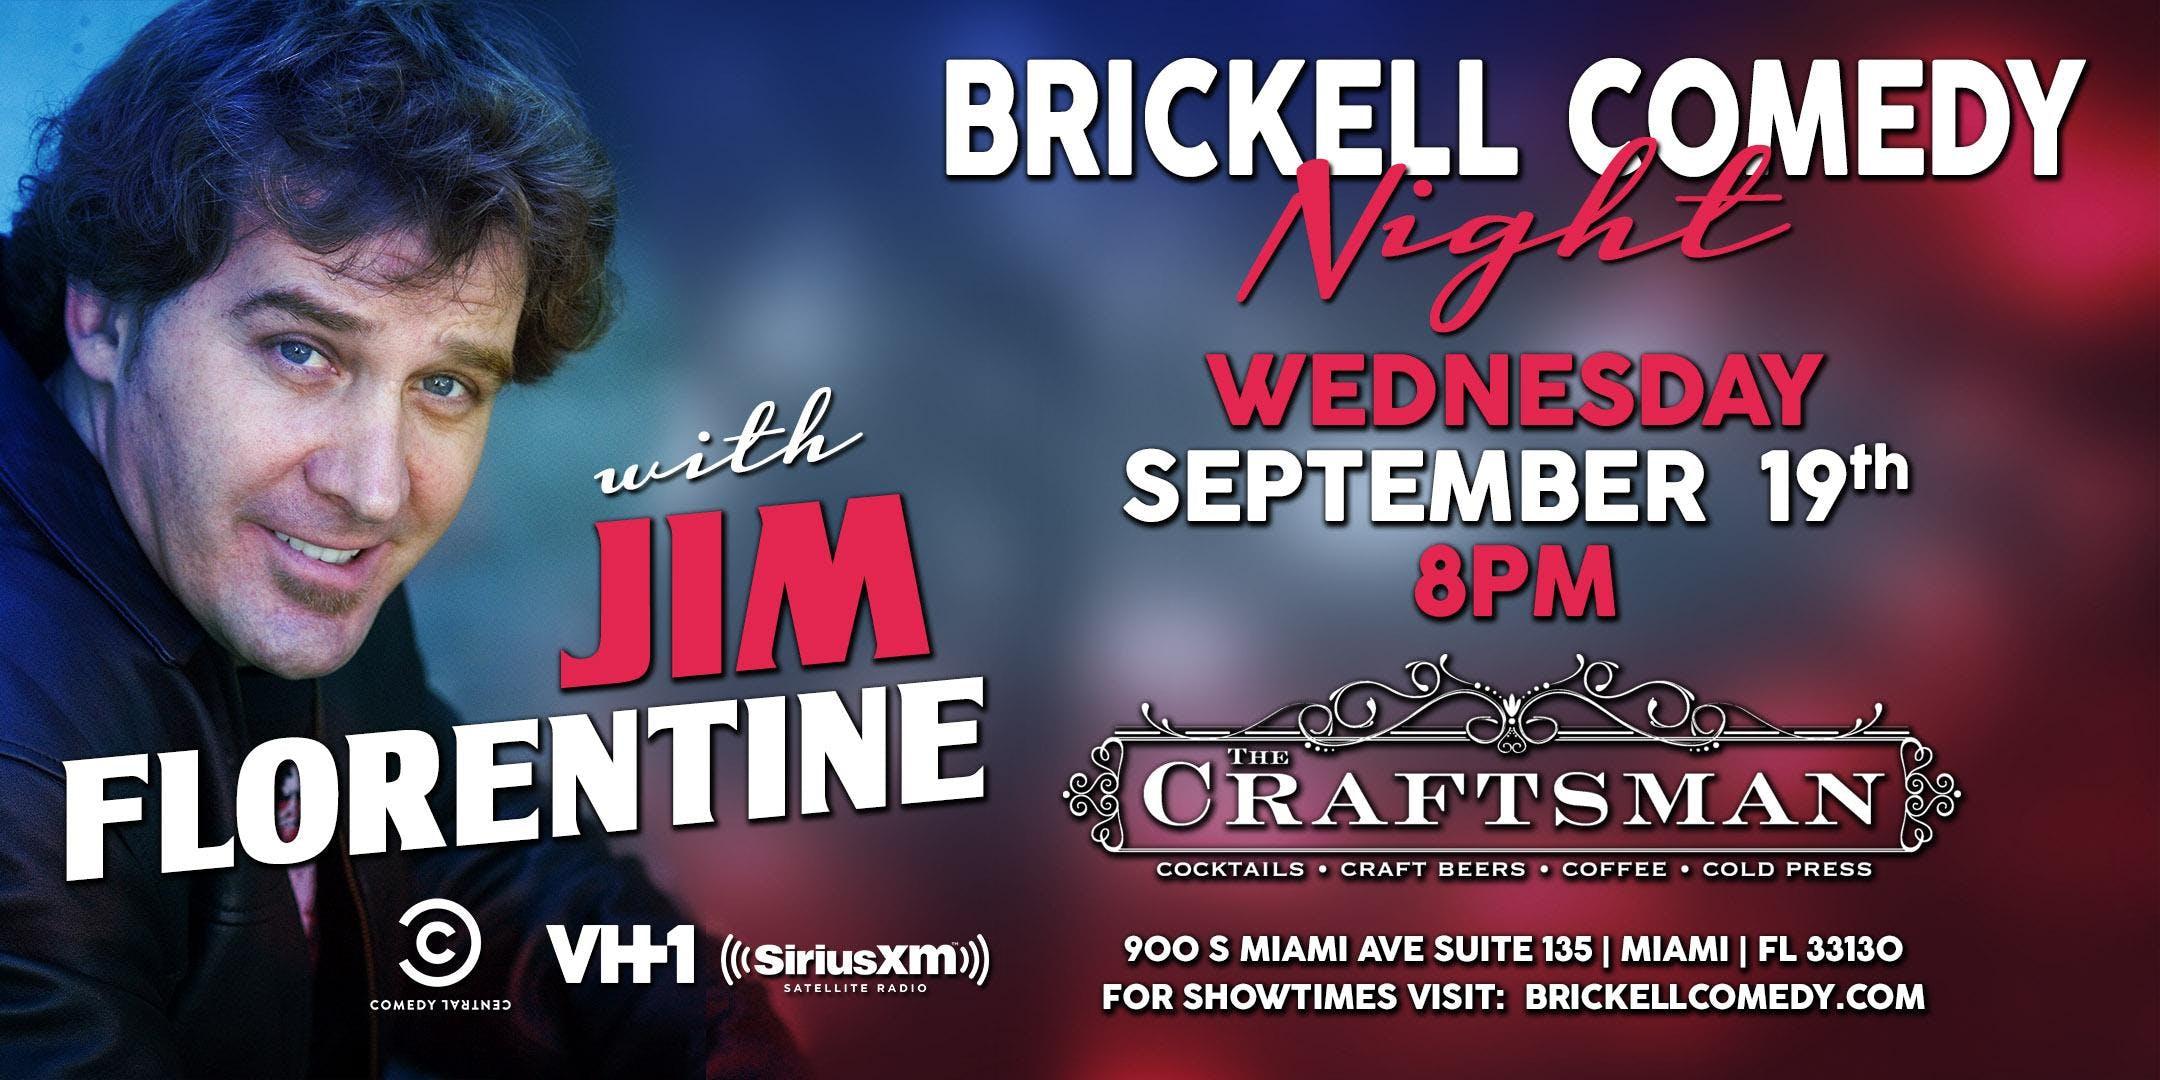 Brickell Comedy Night with Jim Florentine